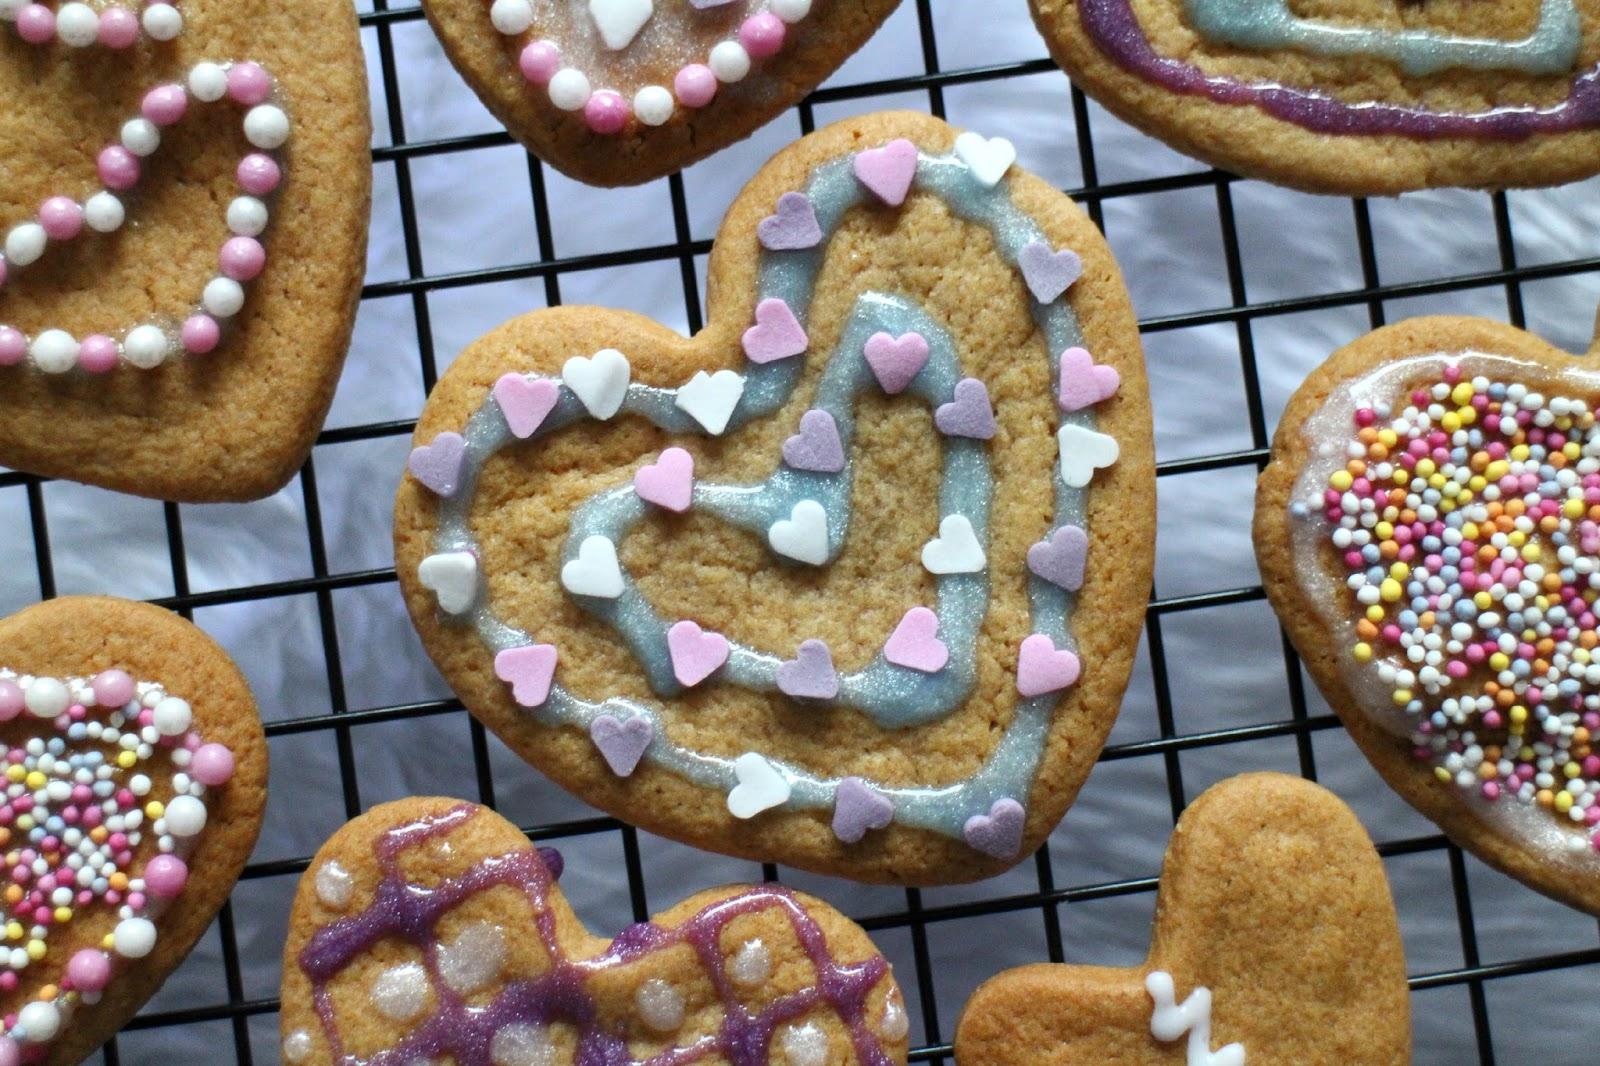 Baking Gingerbread Recipe